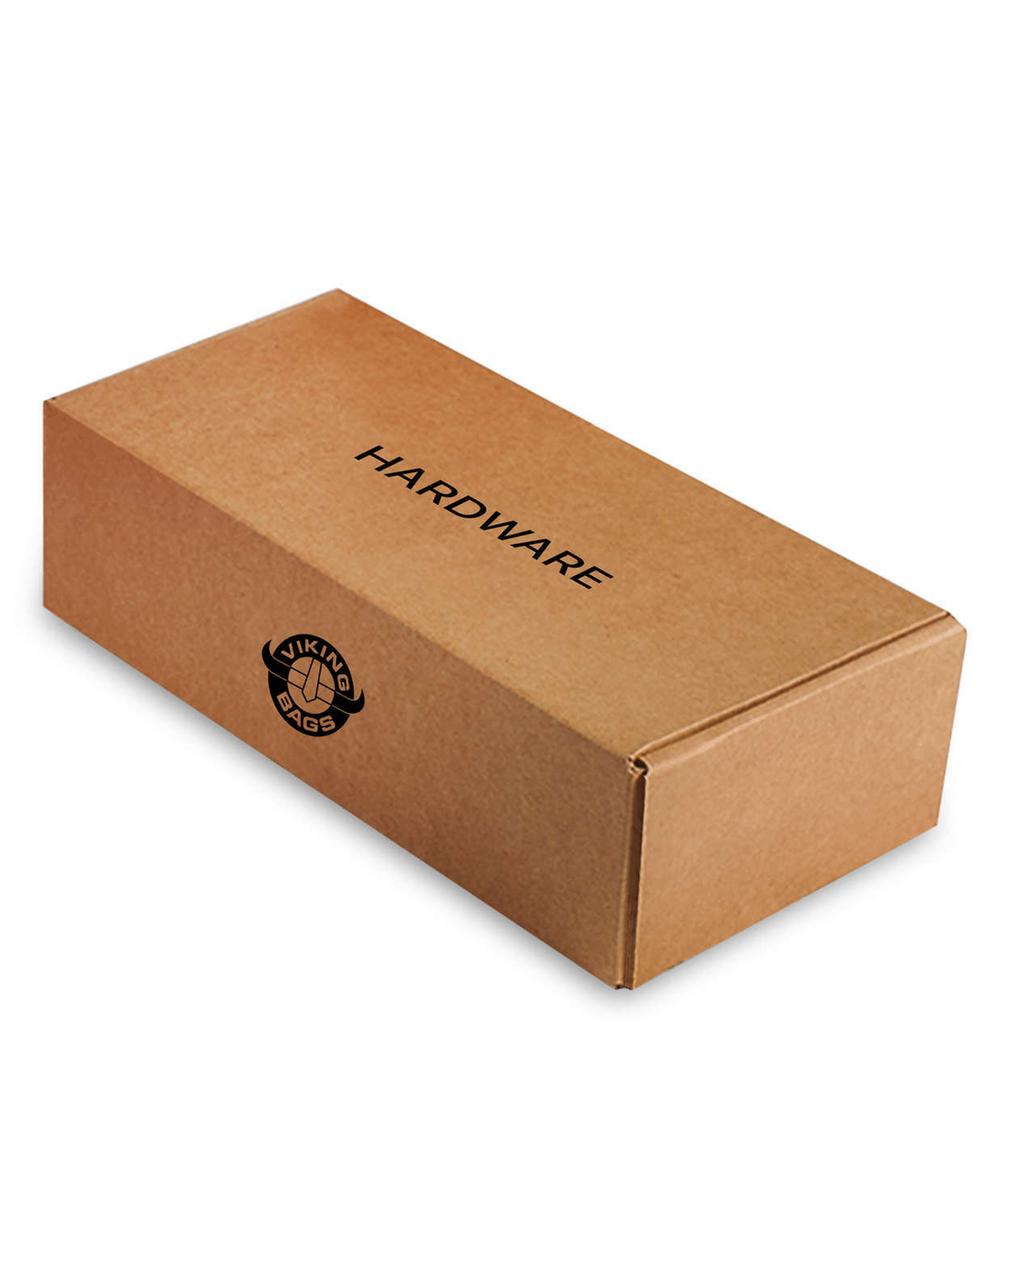 Victory Vegas Trianon Studded Motorcycle Saddlebags Hardware Box